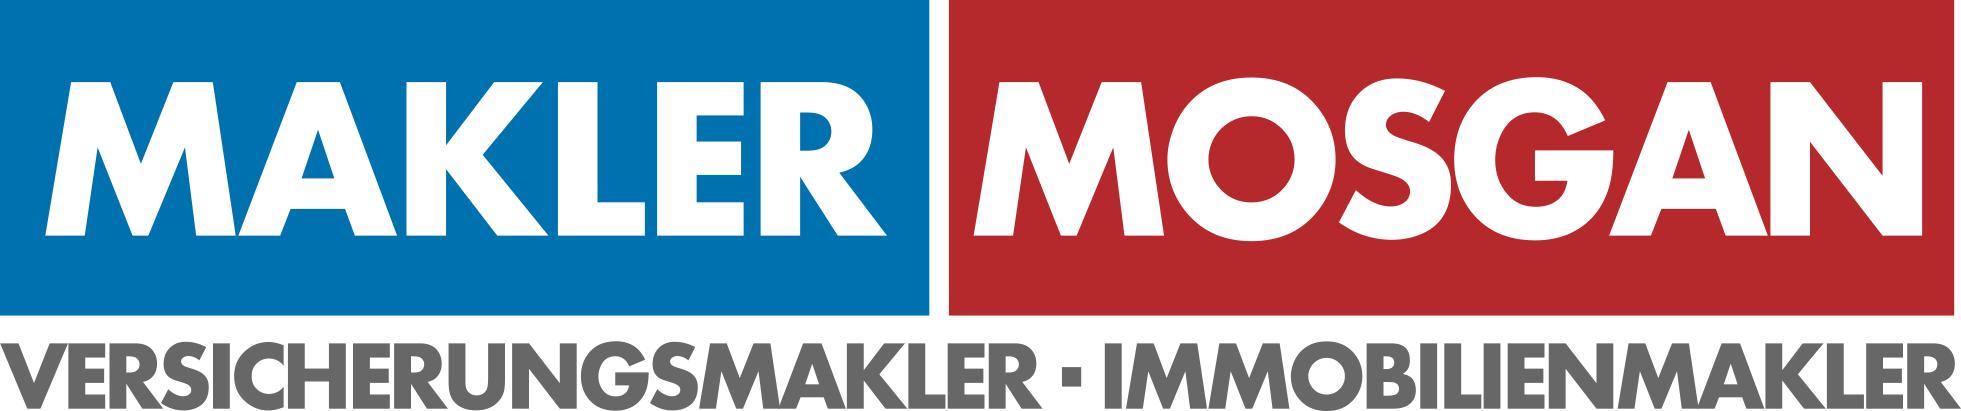 Makler Mosgan